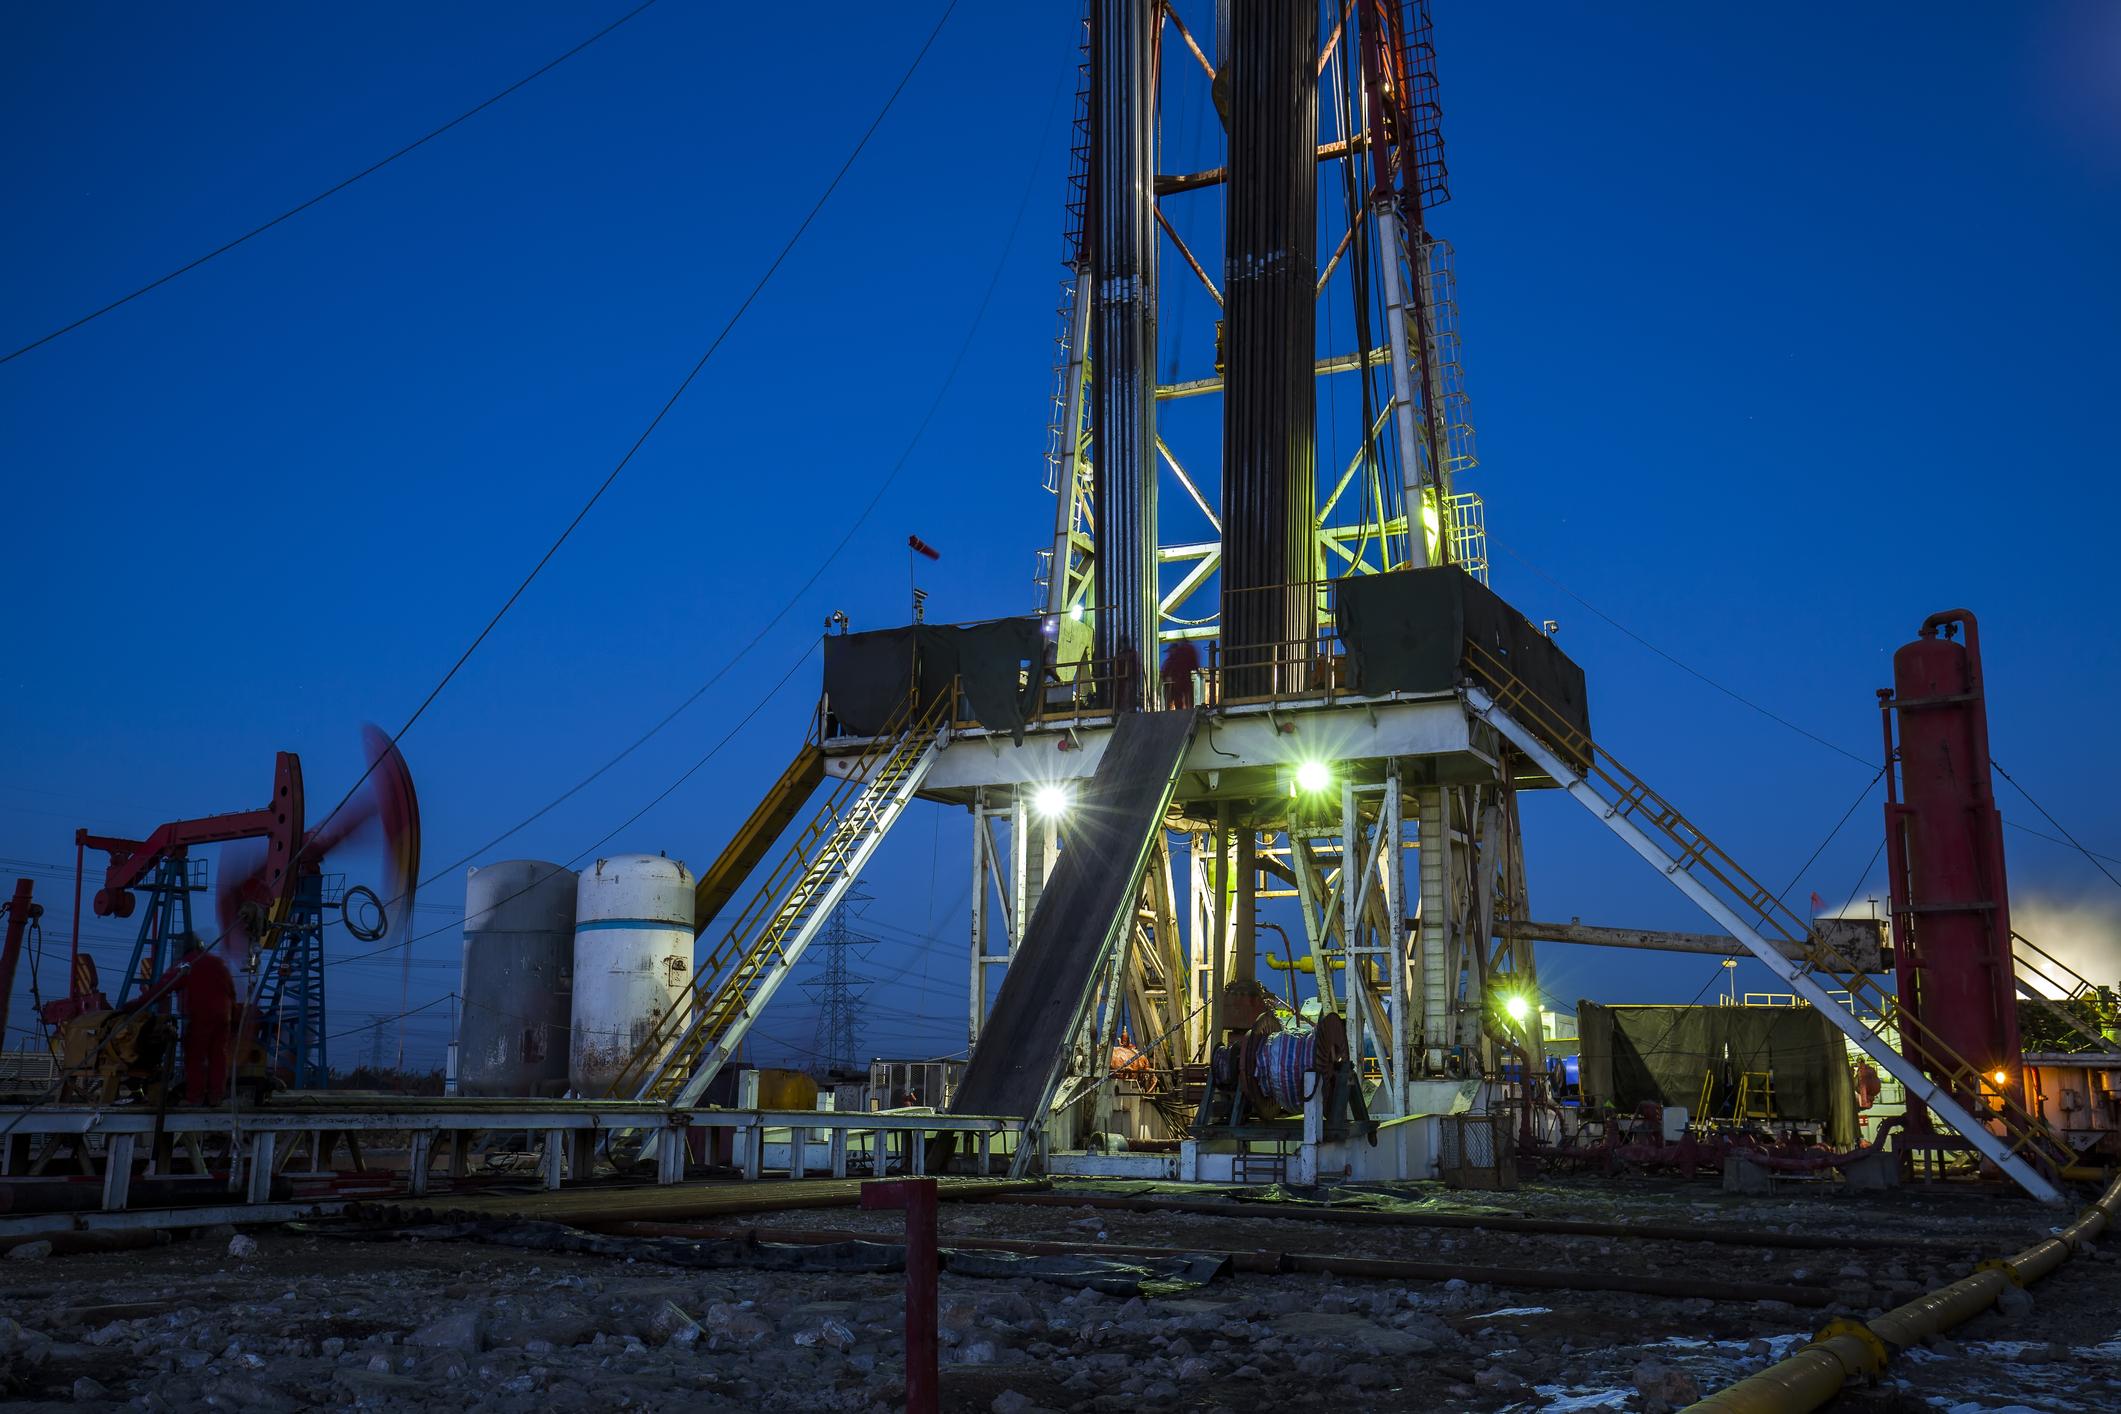 An oil drilling rig near some oil pump jacks.